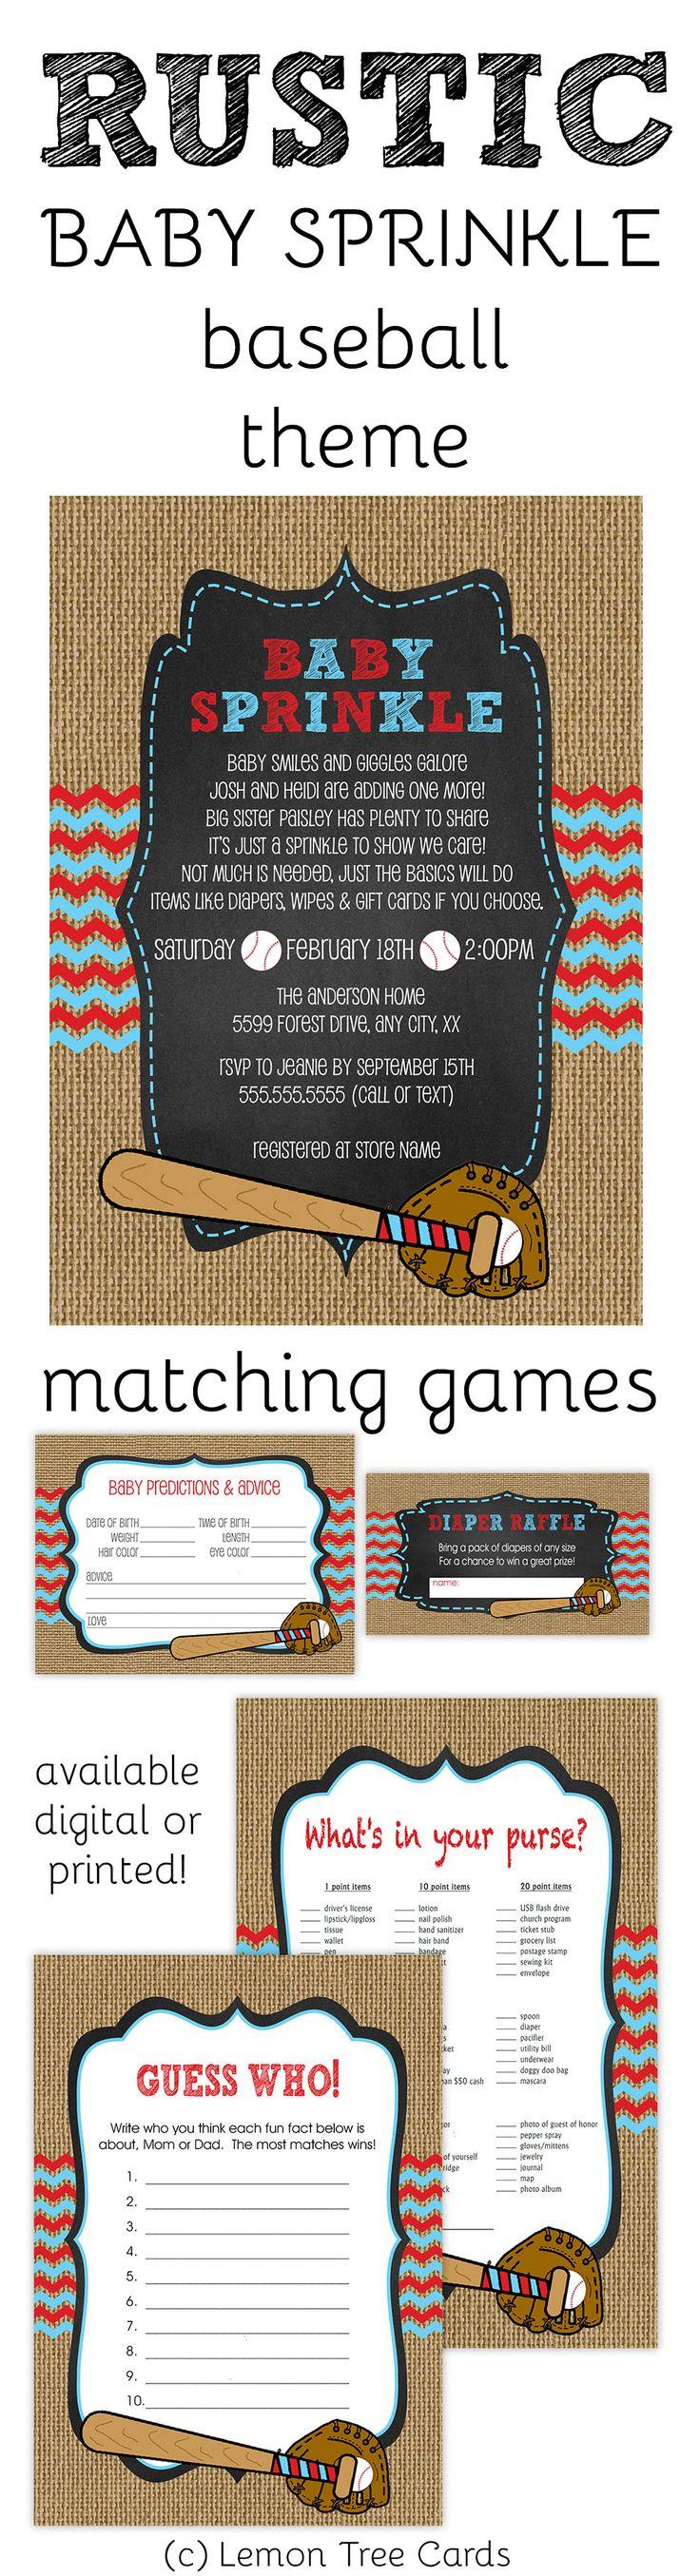 best 25 sprinkle invitations ideas on pinterest baby sprinkle